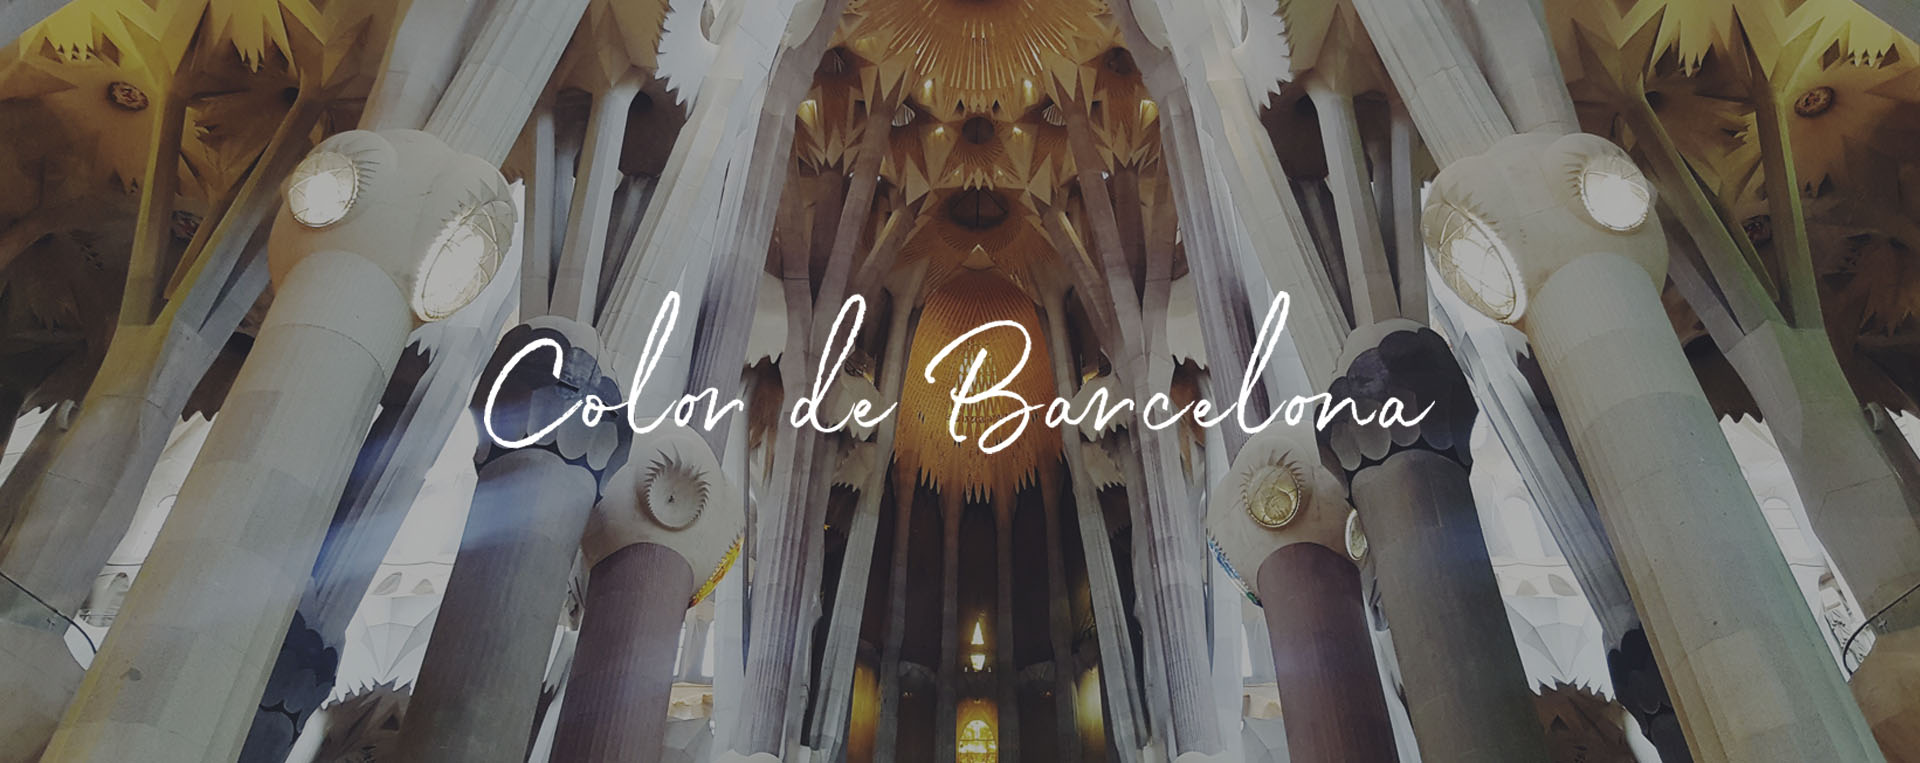 Roxa color de Barcelona